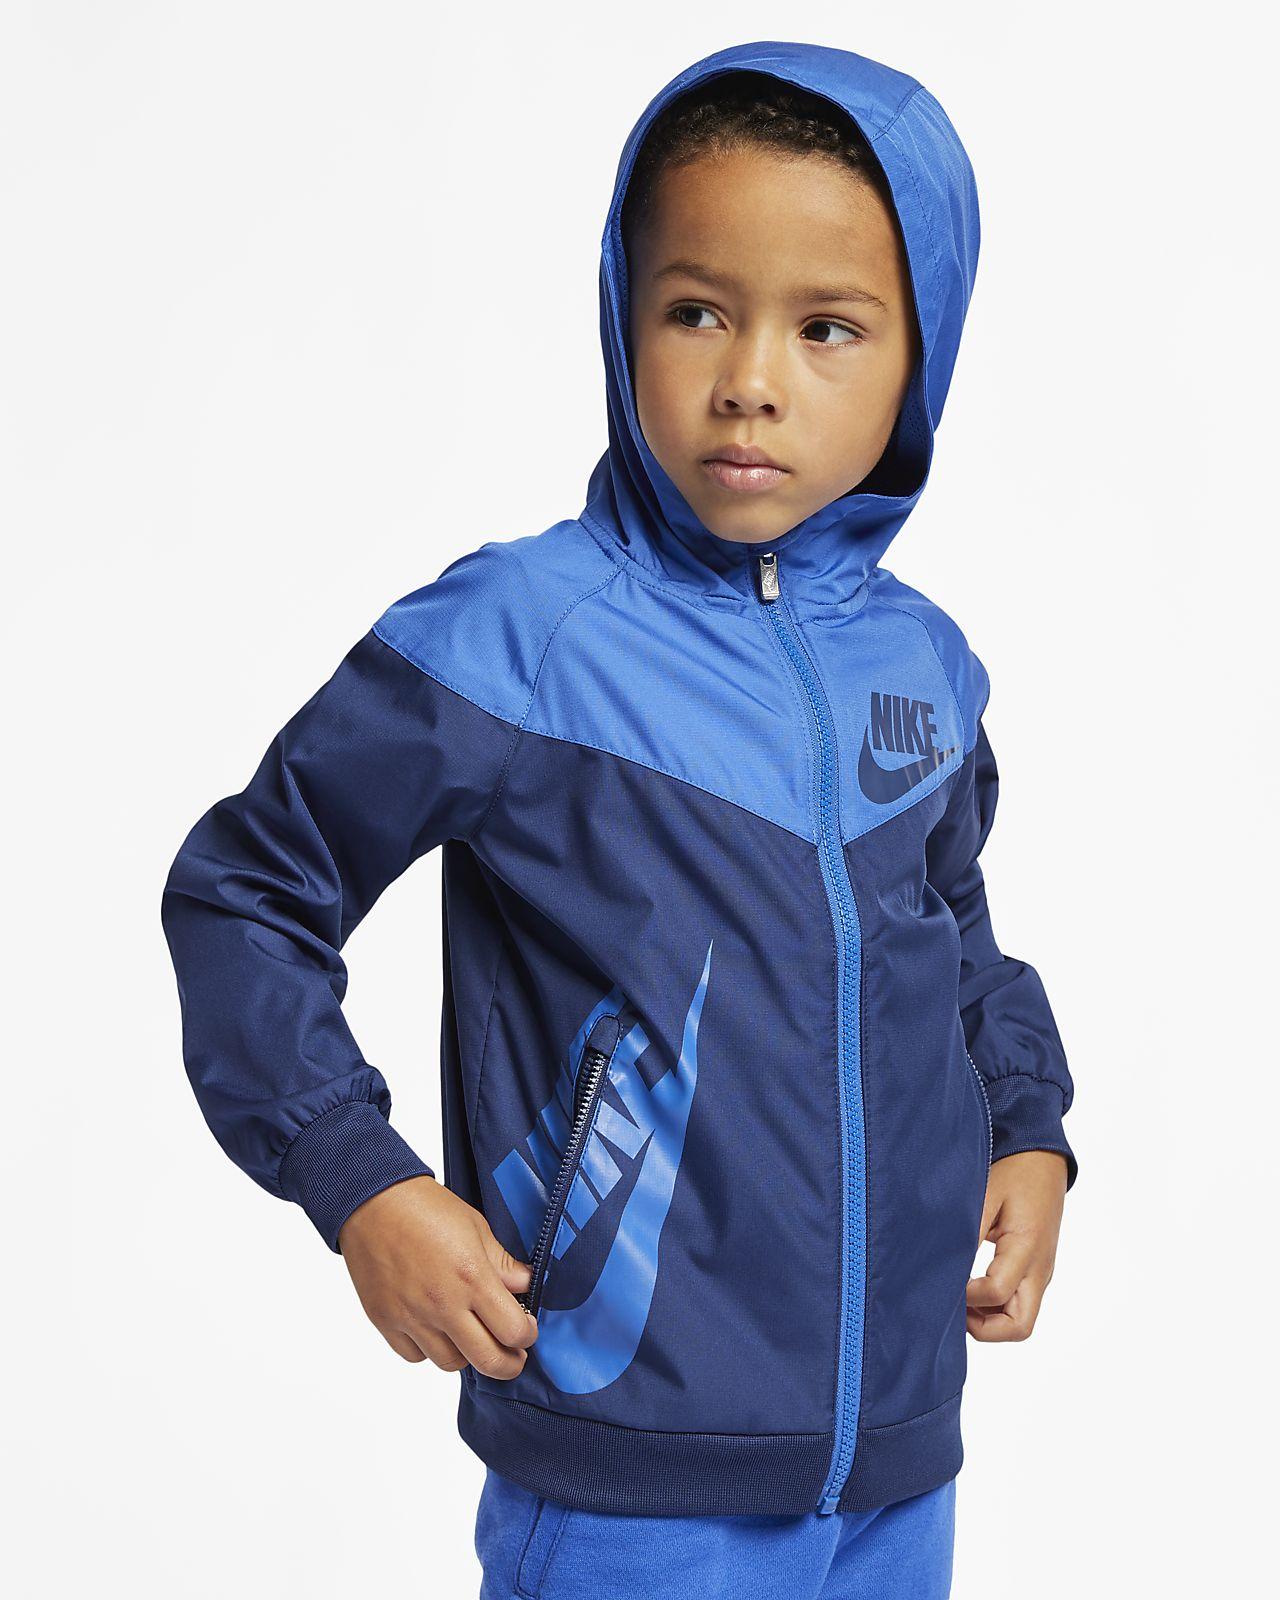 buy online 70909 fbcfc Low Resolution Nike Sportswear Windrunner Toddler Jacket Nike Sportswear  Windrunner Toddler Jacket